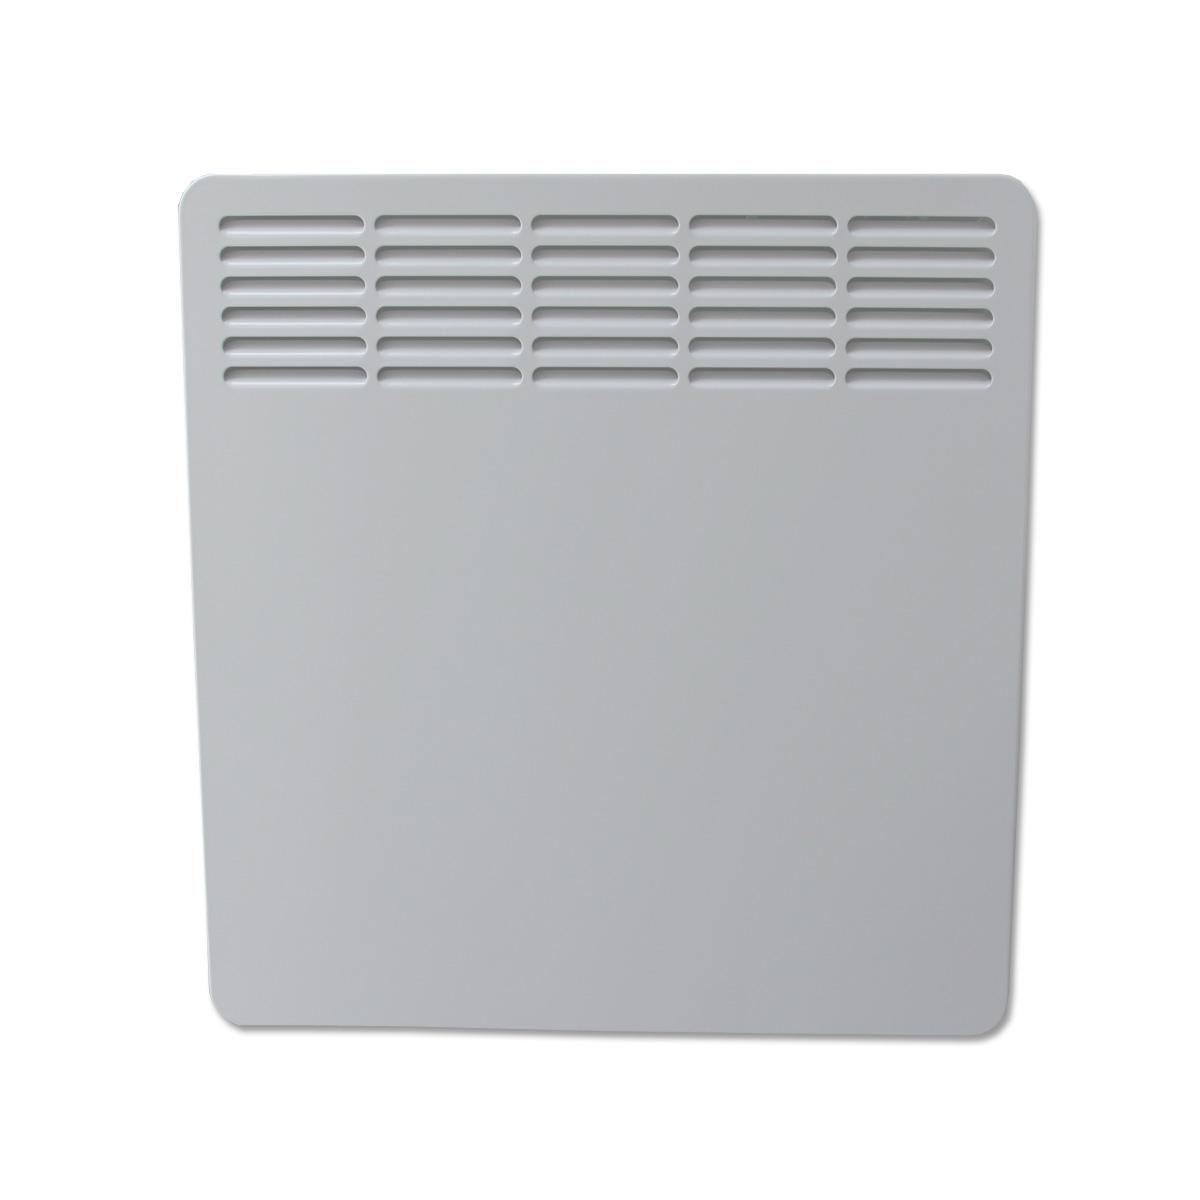 Container-Heizer / Elektroheizer / Wandkonvektor 1.000W - AEG